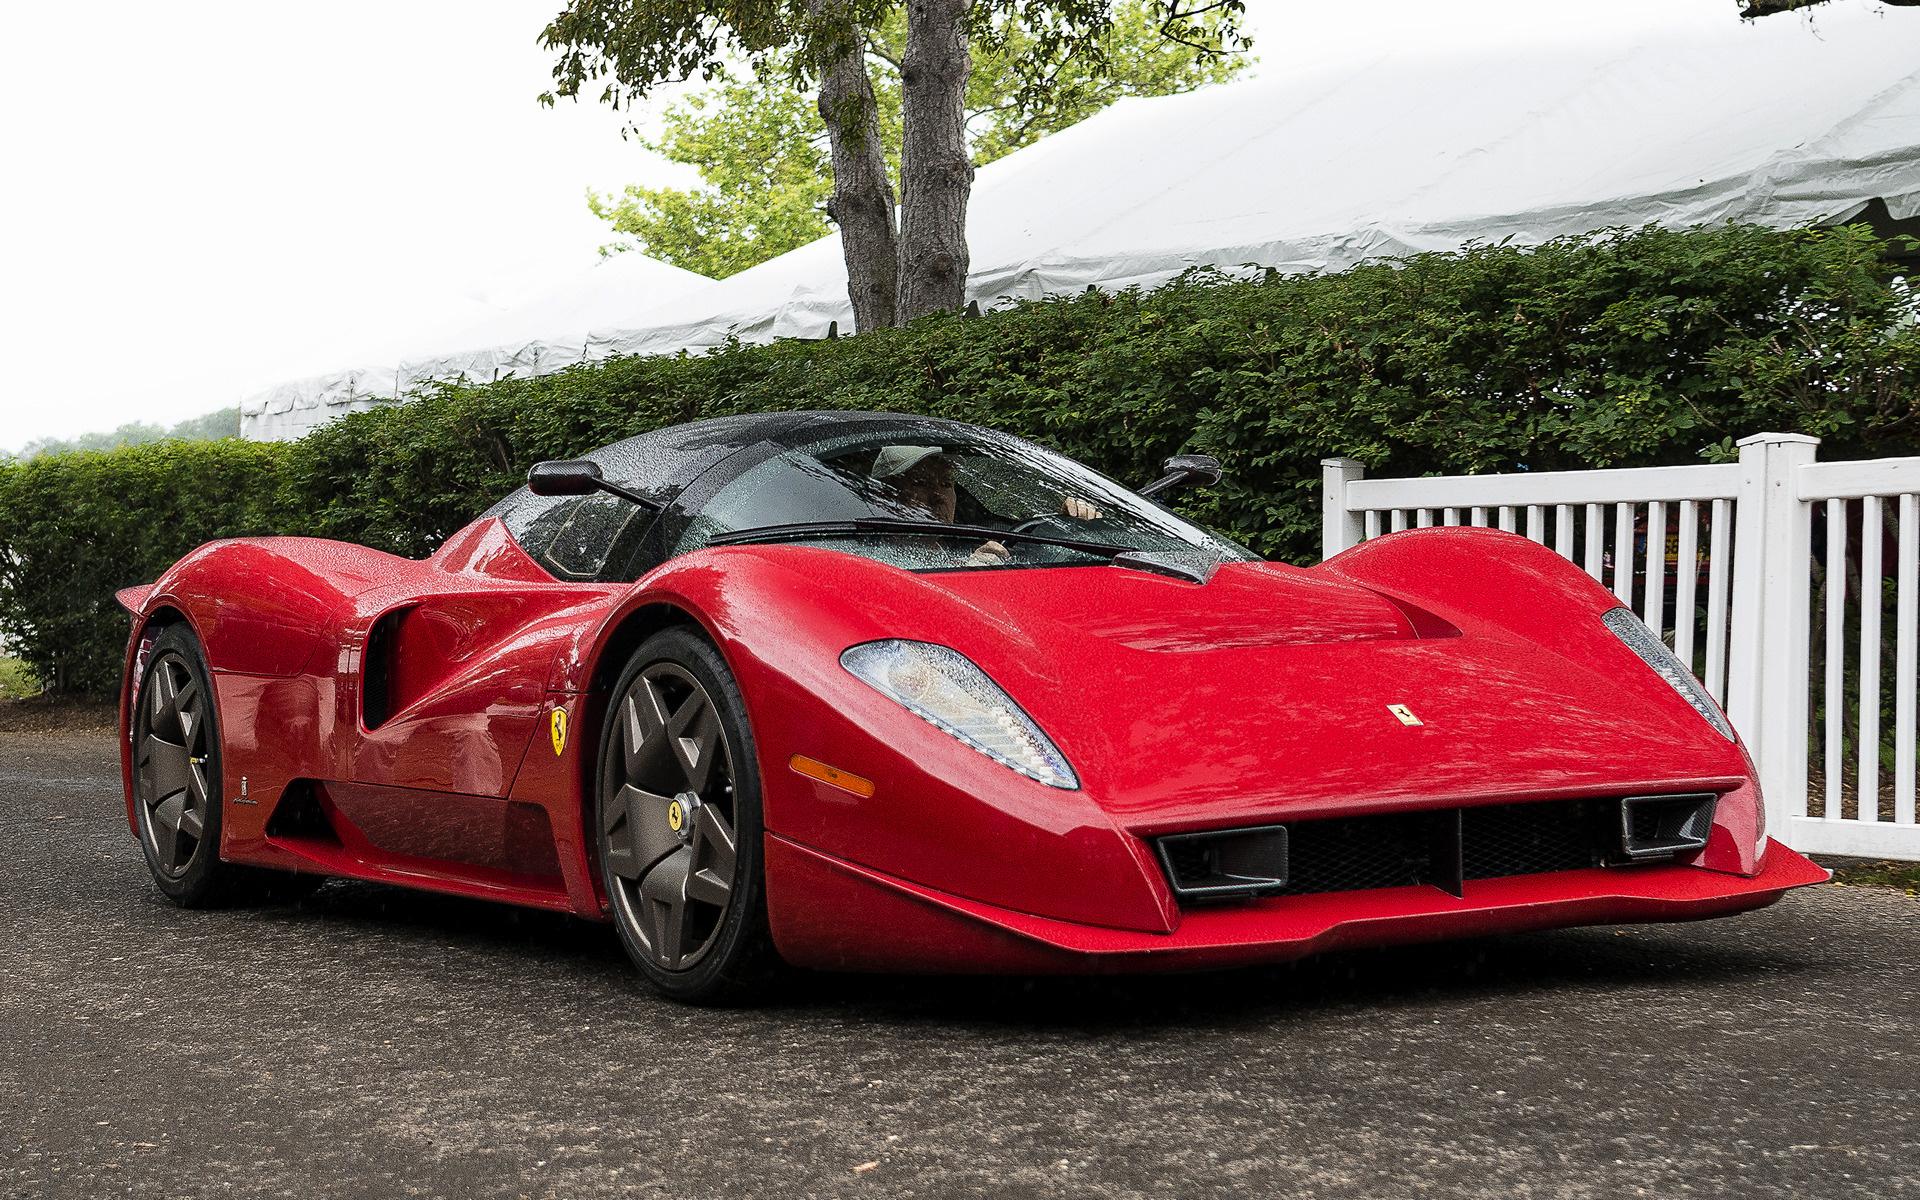 2006 Ferrari P45 By Pininfarina Wallpapers And Hd Images